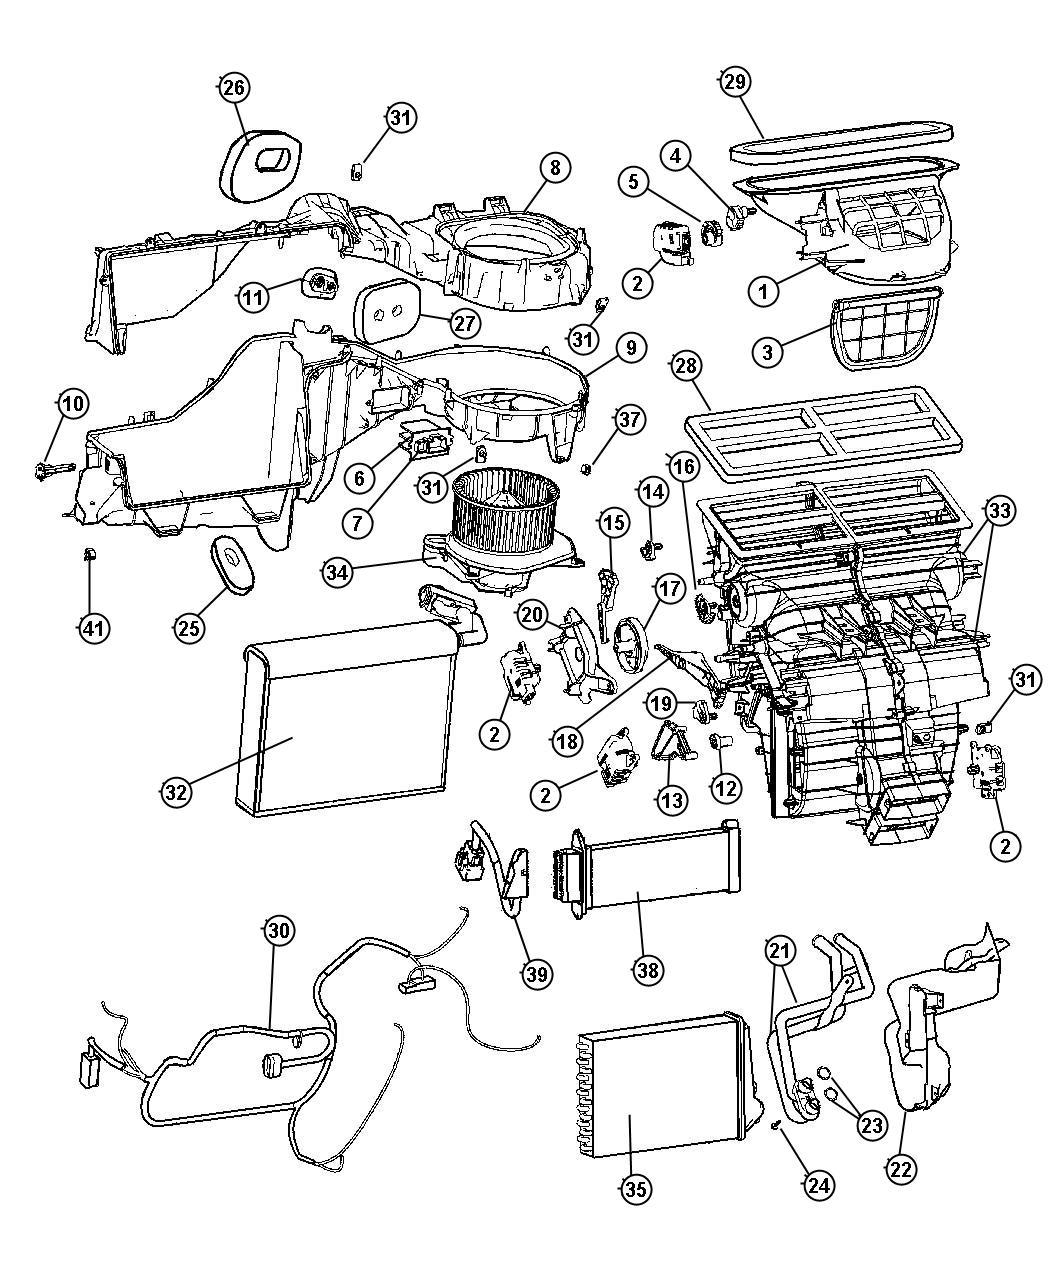 Jeep Grand Cherokee Grommet Evaporator Tubes